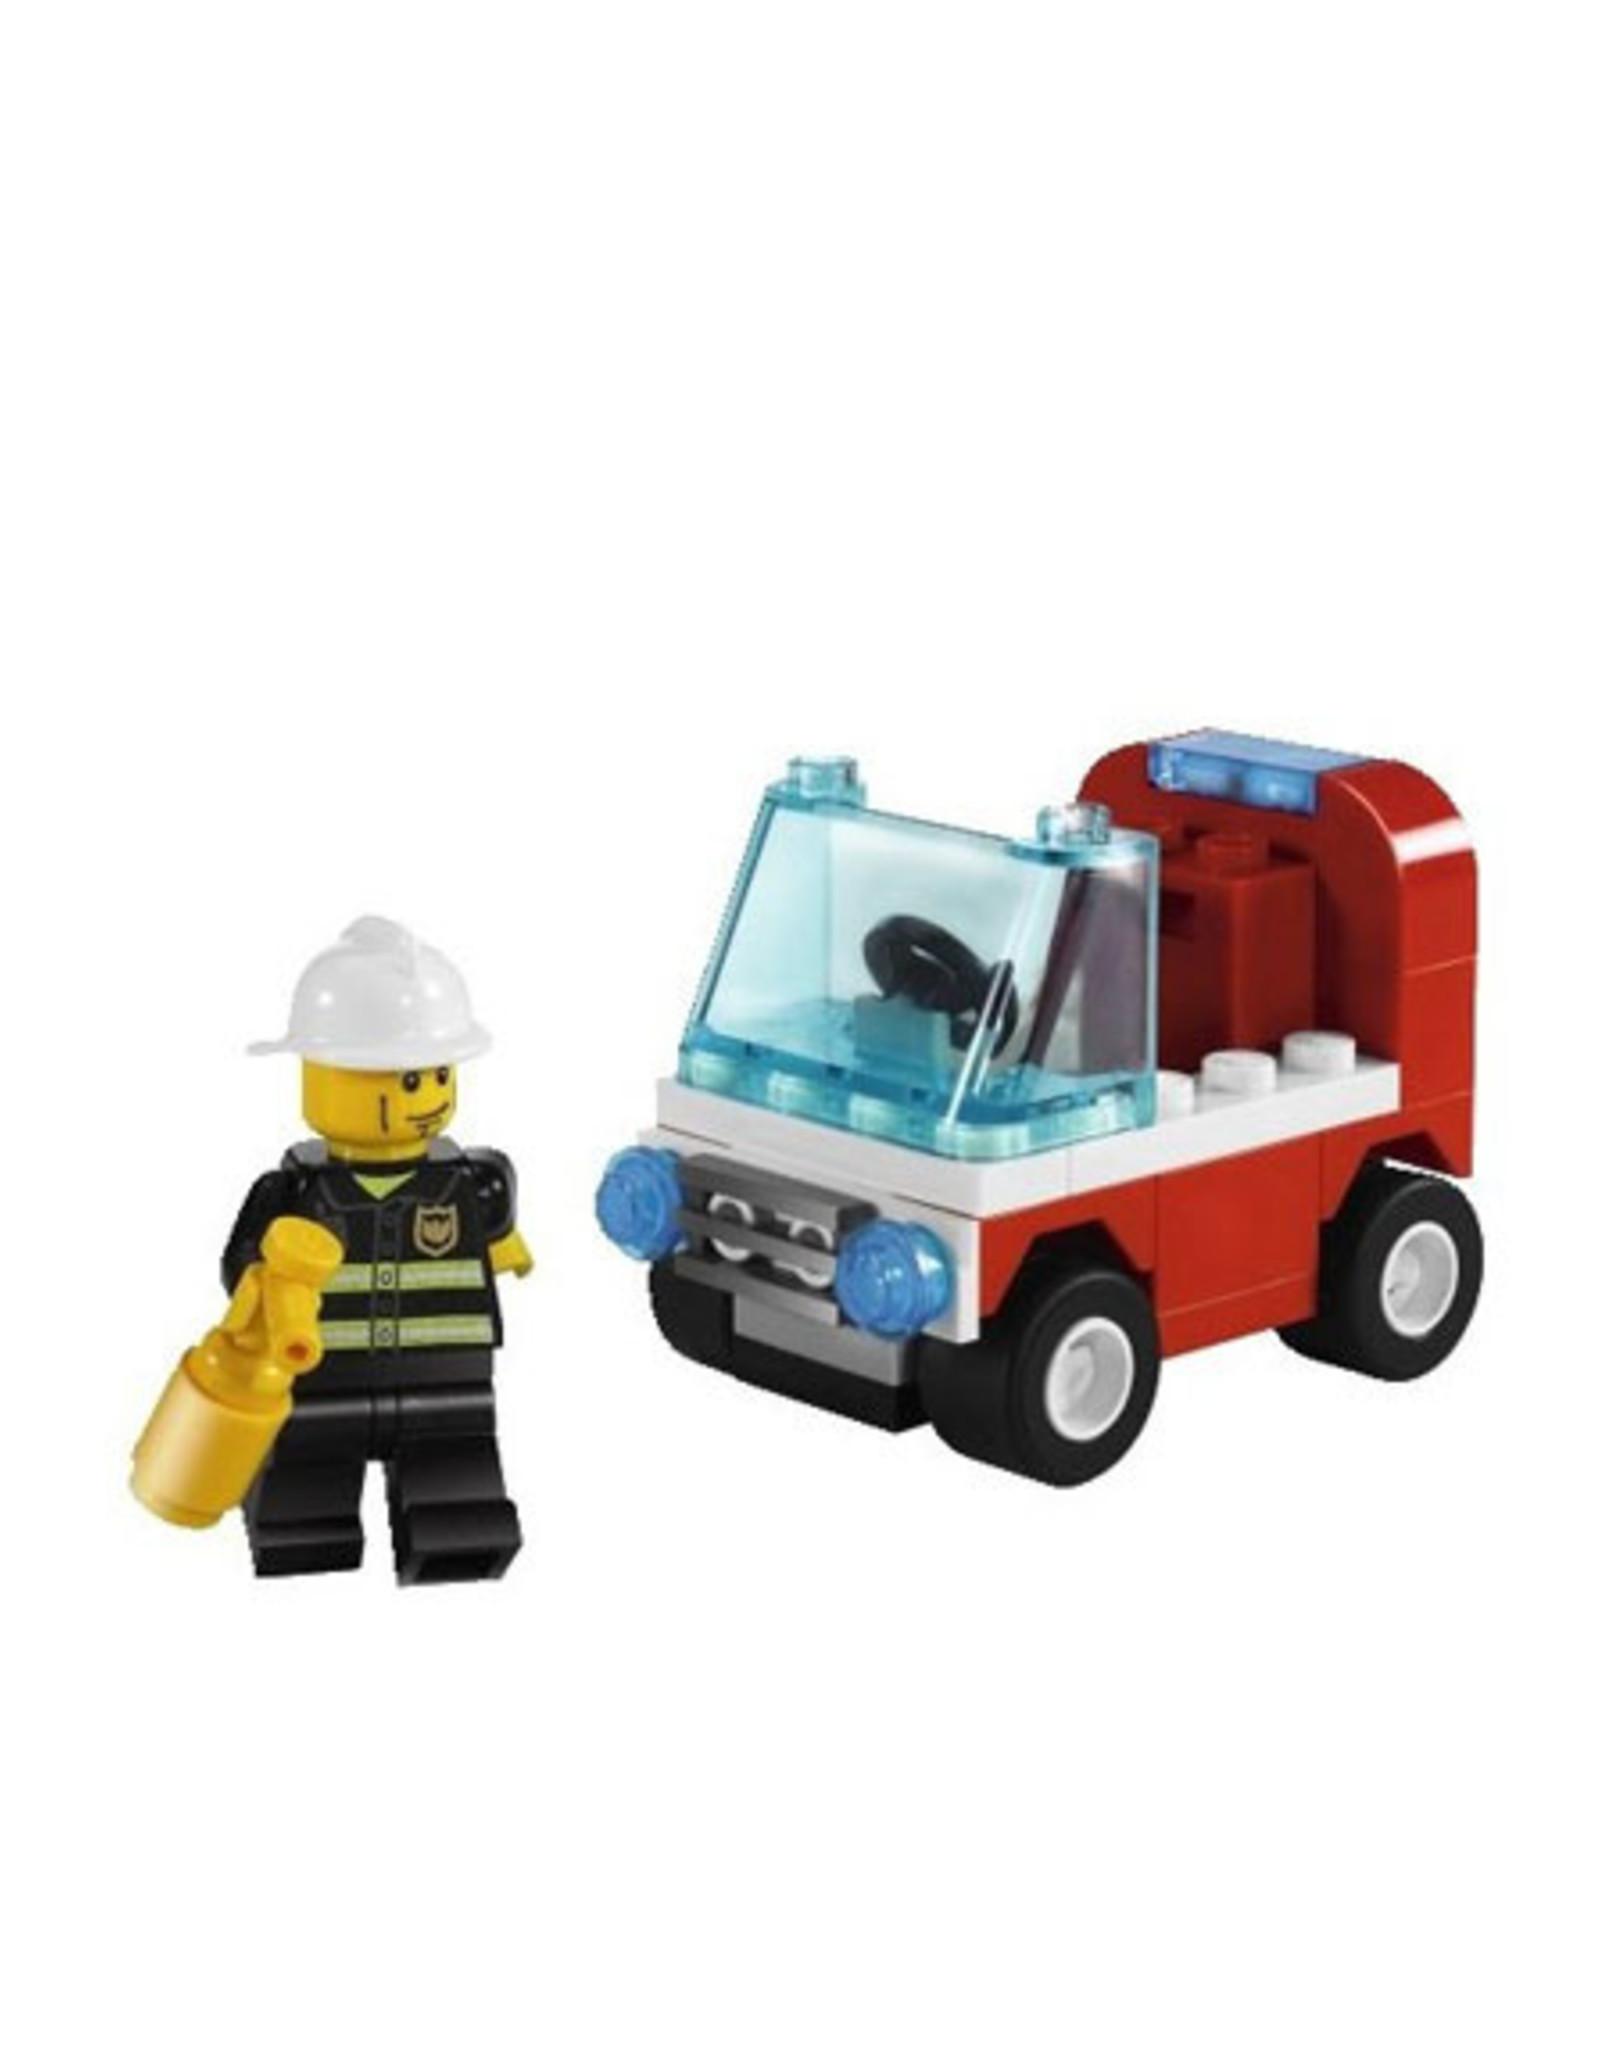 LEGO LEGO 30001 Fireman's Car CITY